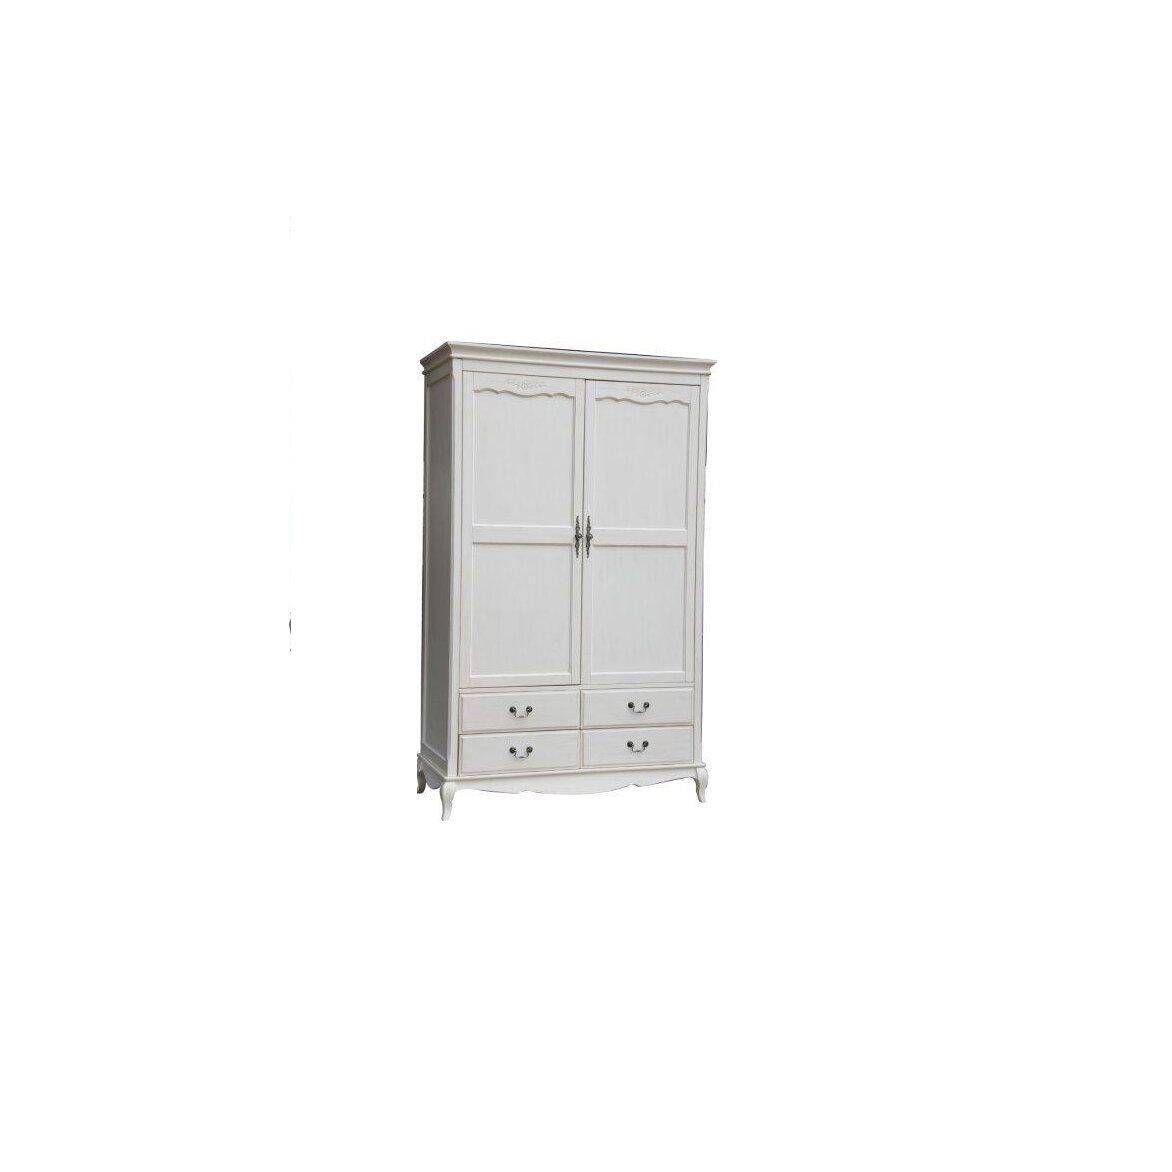 Шкаф двухстворчатый с 4-я ящиками Leontina, бежевого цвета 2 | Платяные шкафы Kingsby